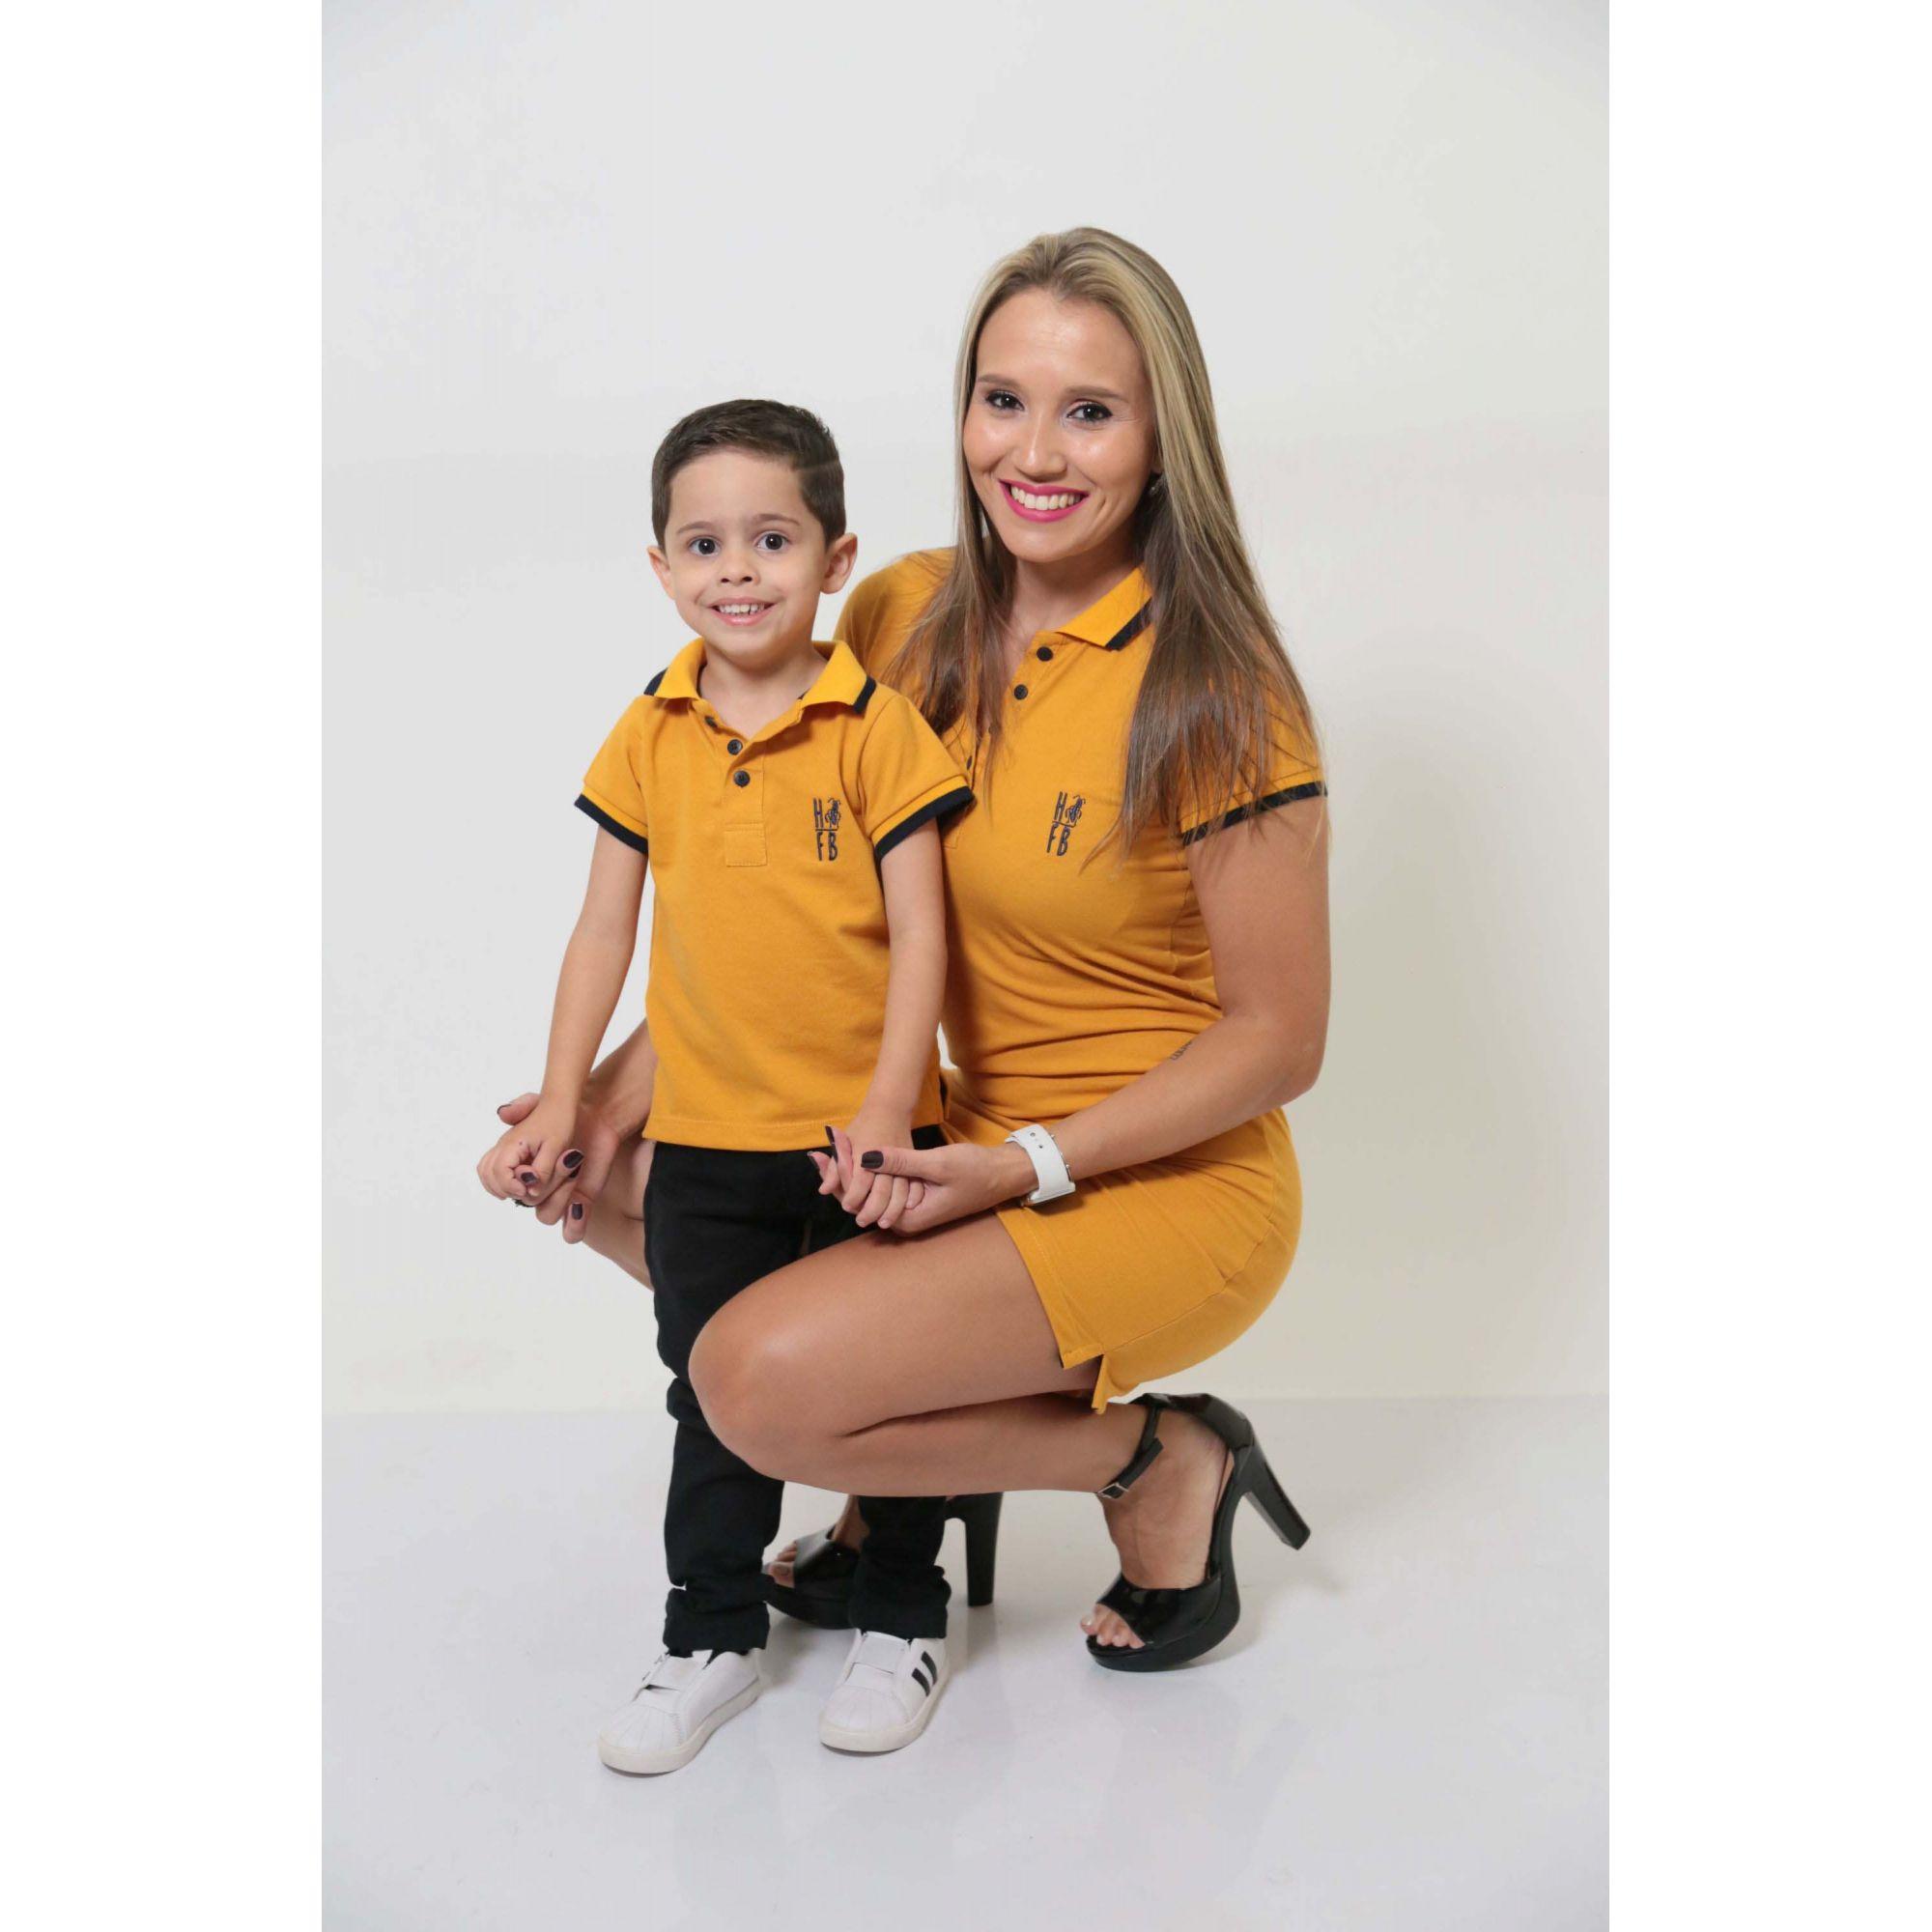 MÃE E FILHO > Kit 02 peças Vestido e Camisa ou Body Polo Mostarda [Coleção Tal Mãe Tal Filho]  - Heitor Fashion Brazil